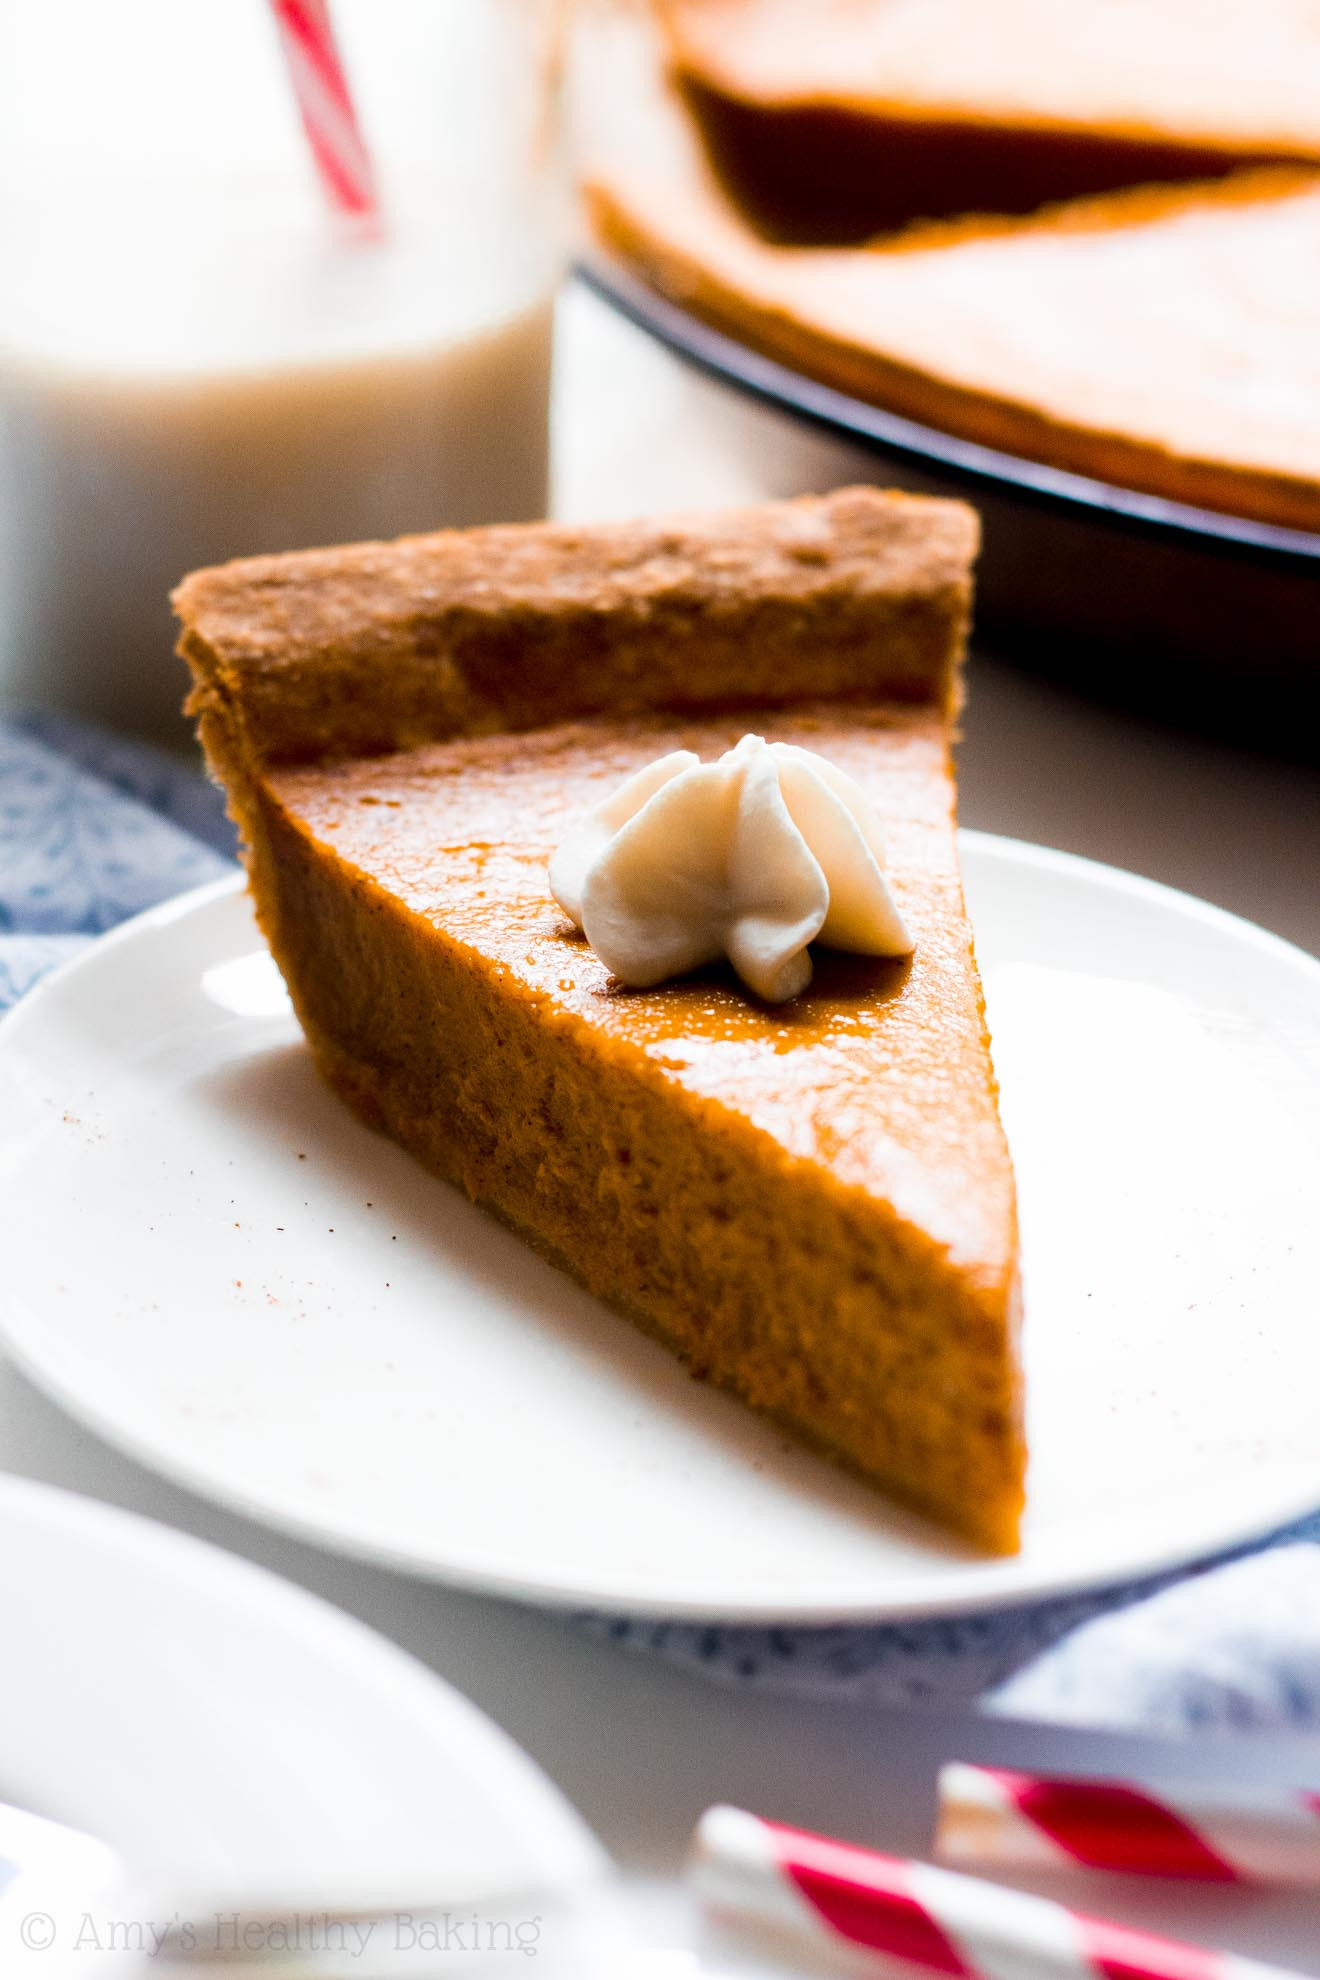 Pumpkin Desserts Healthy  The Ultimate Healthy Pumpkin Pie